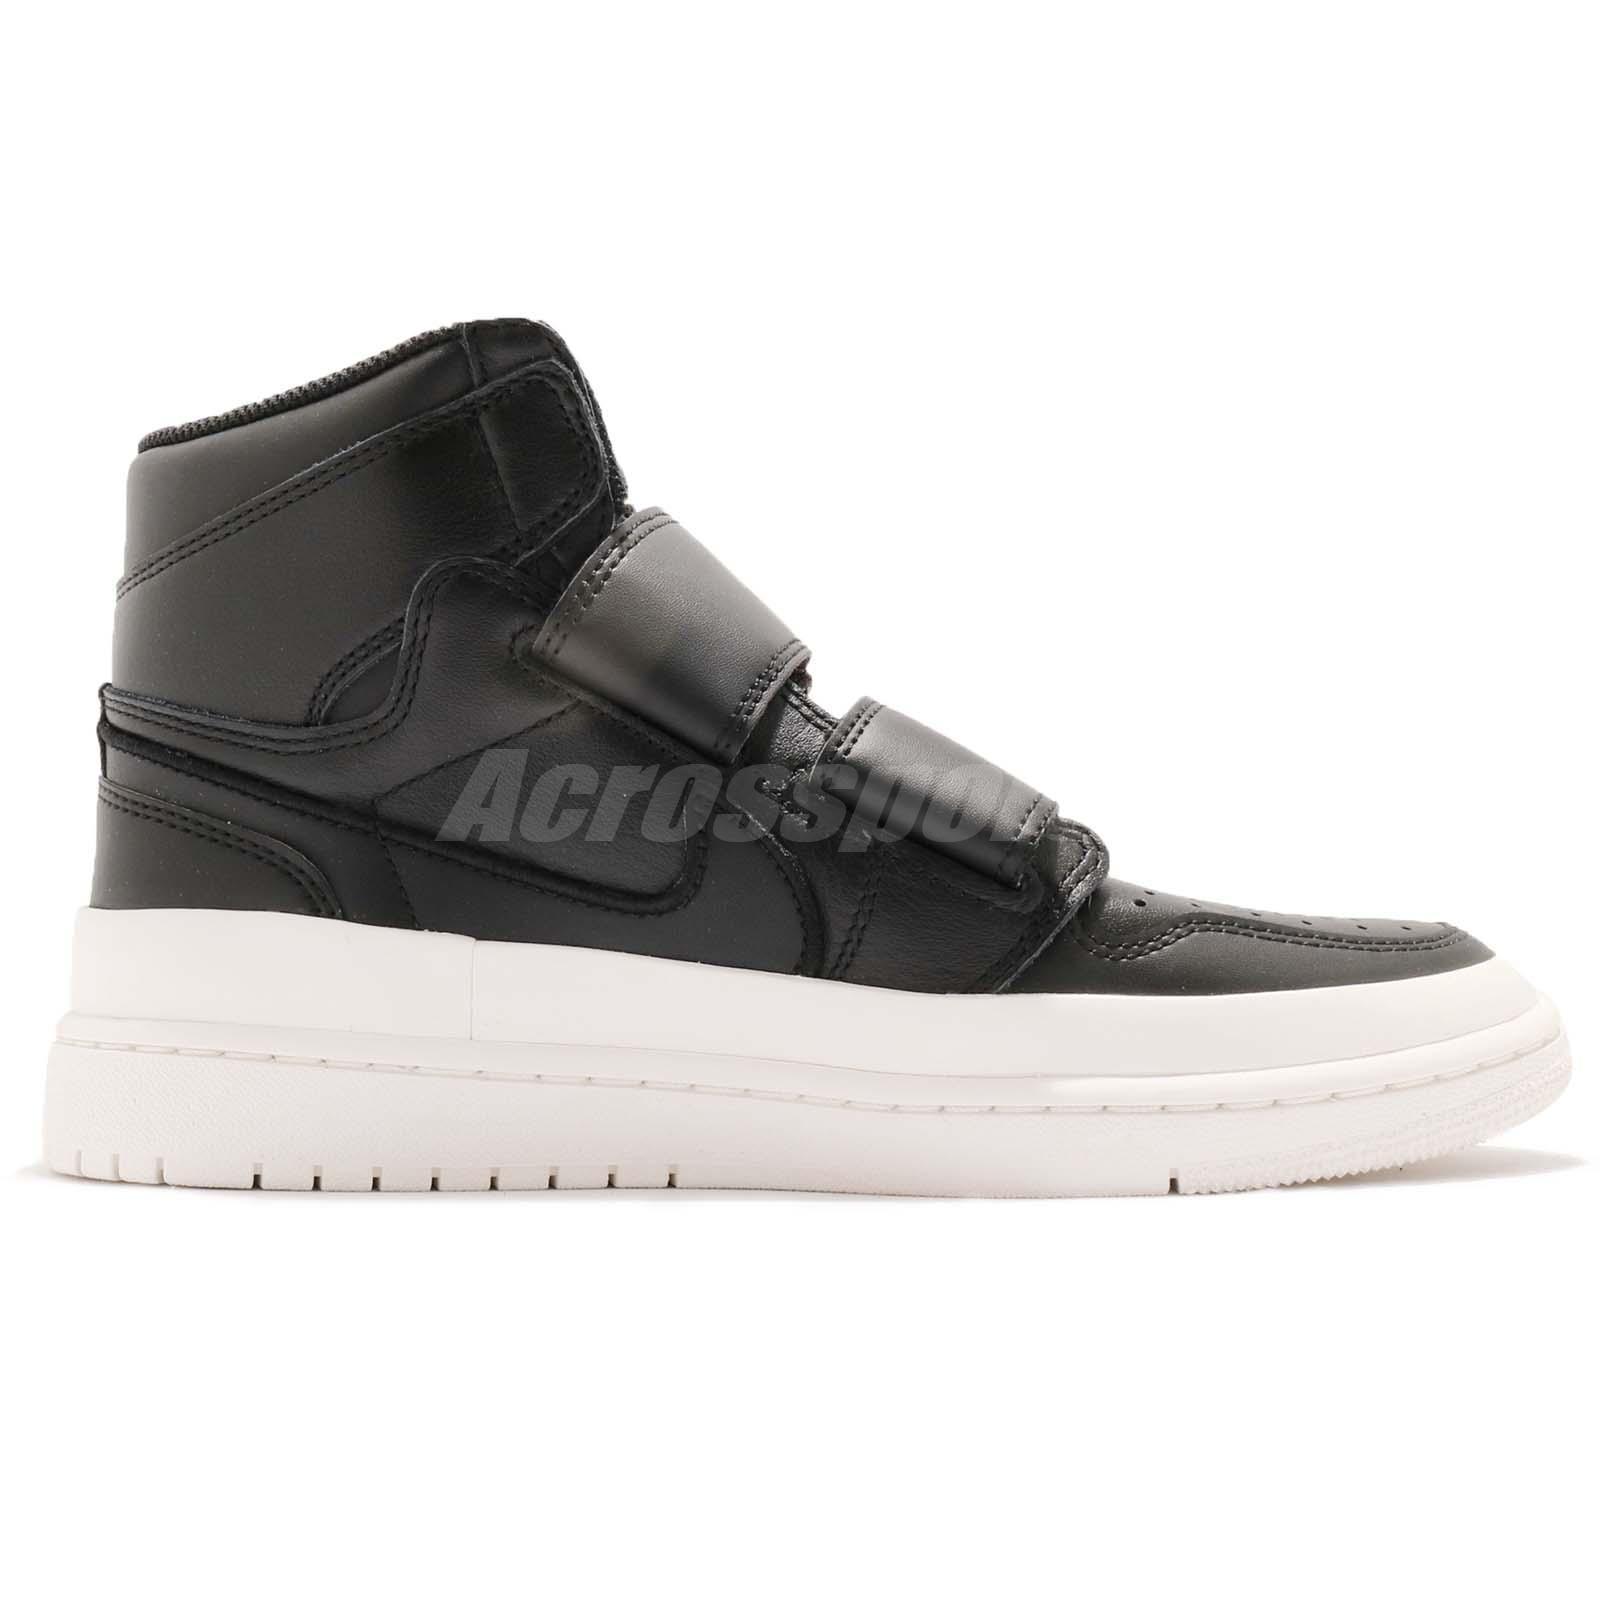 852e3d52fe1a09 Nike Air Jordan 1 RE Hi Double STRP Strap I AJ1 Black Men Casual ...